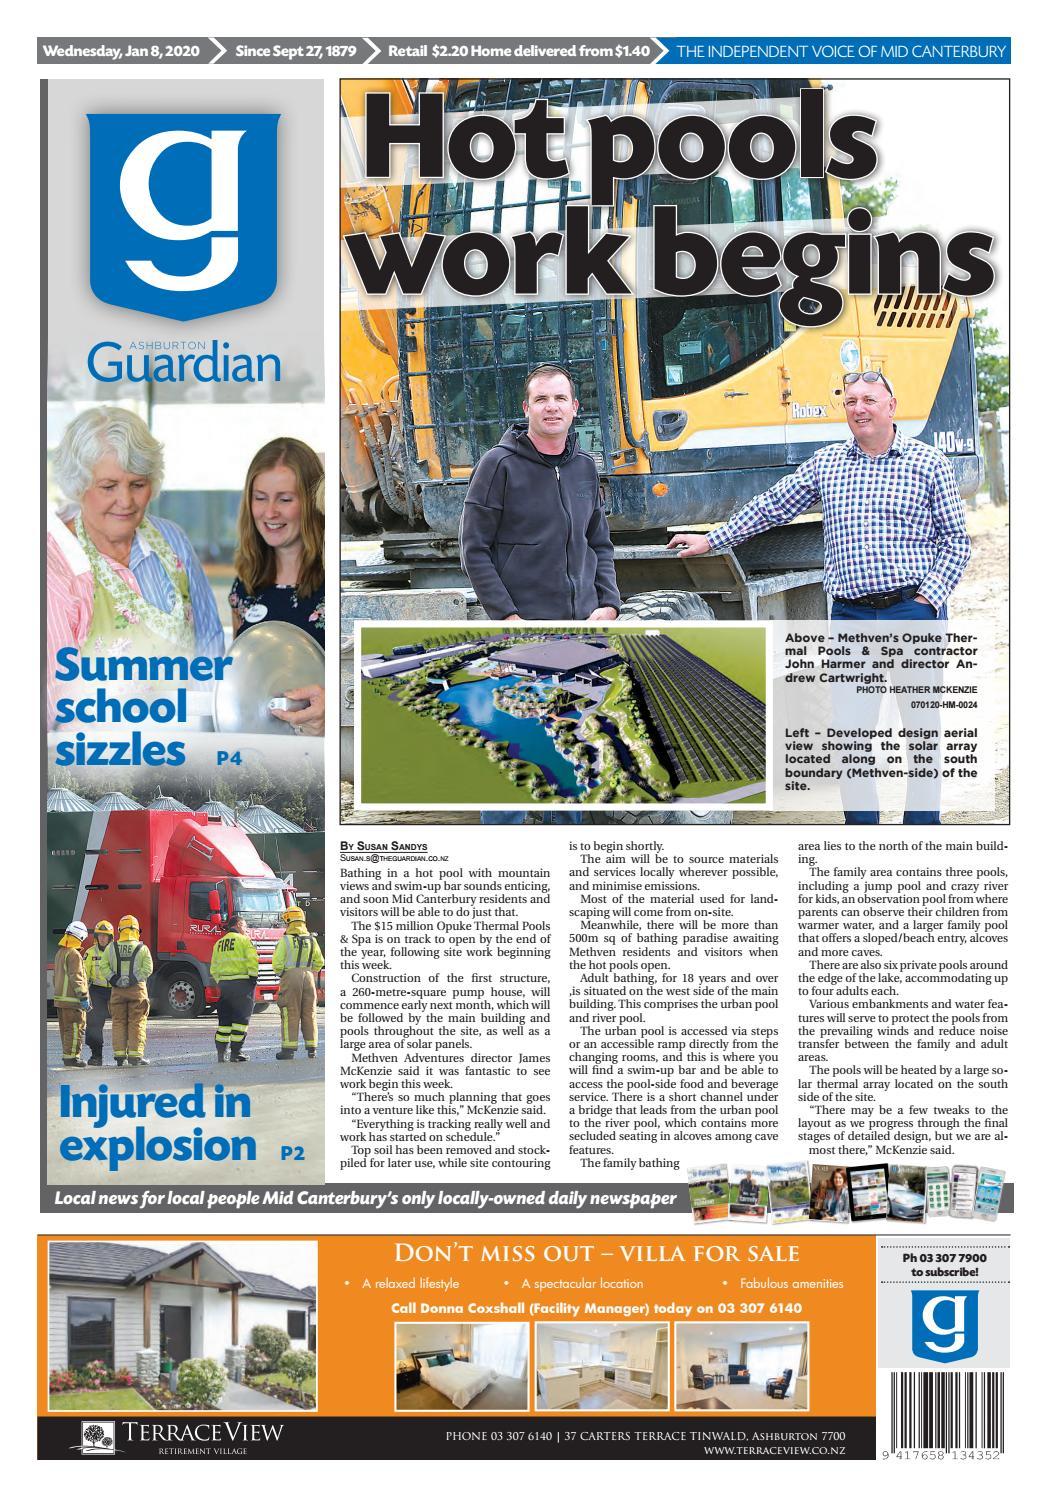 Ashburton Guardian Wednesday January 8 2020 By Ashburton